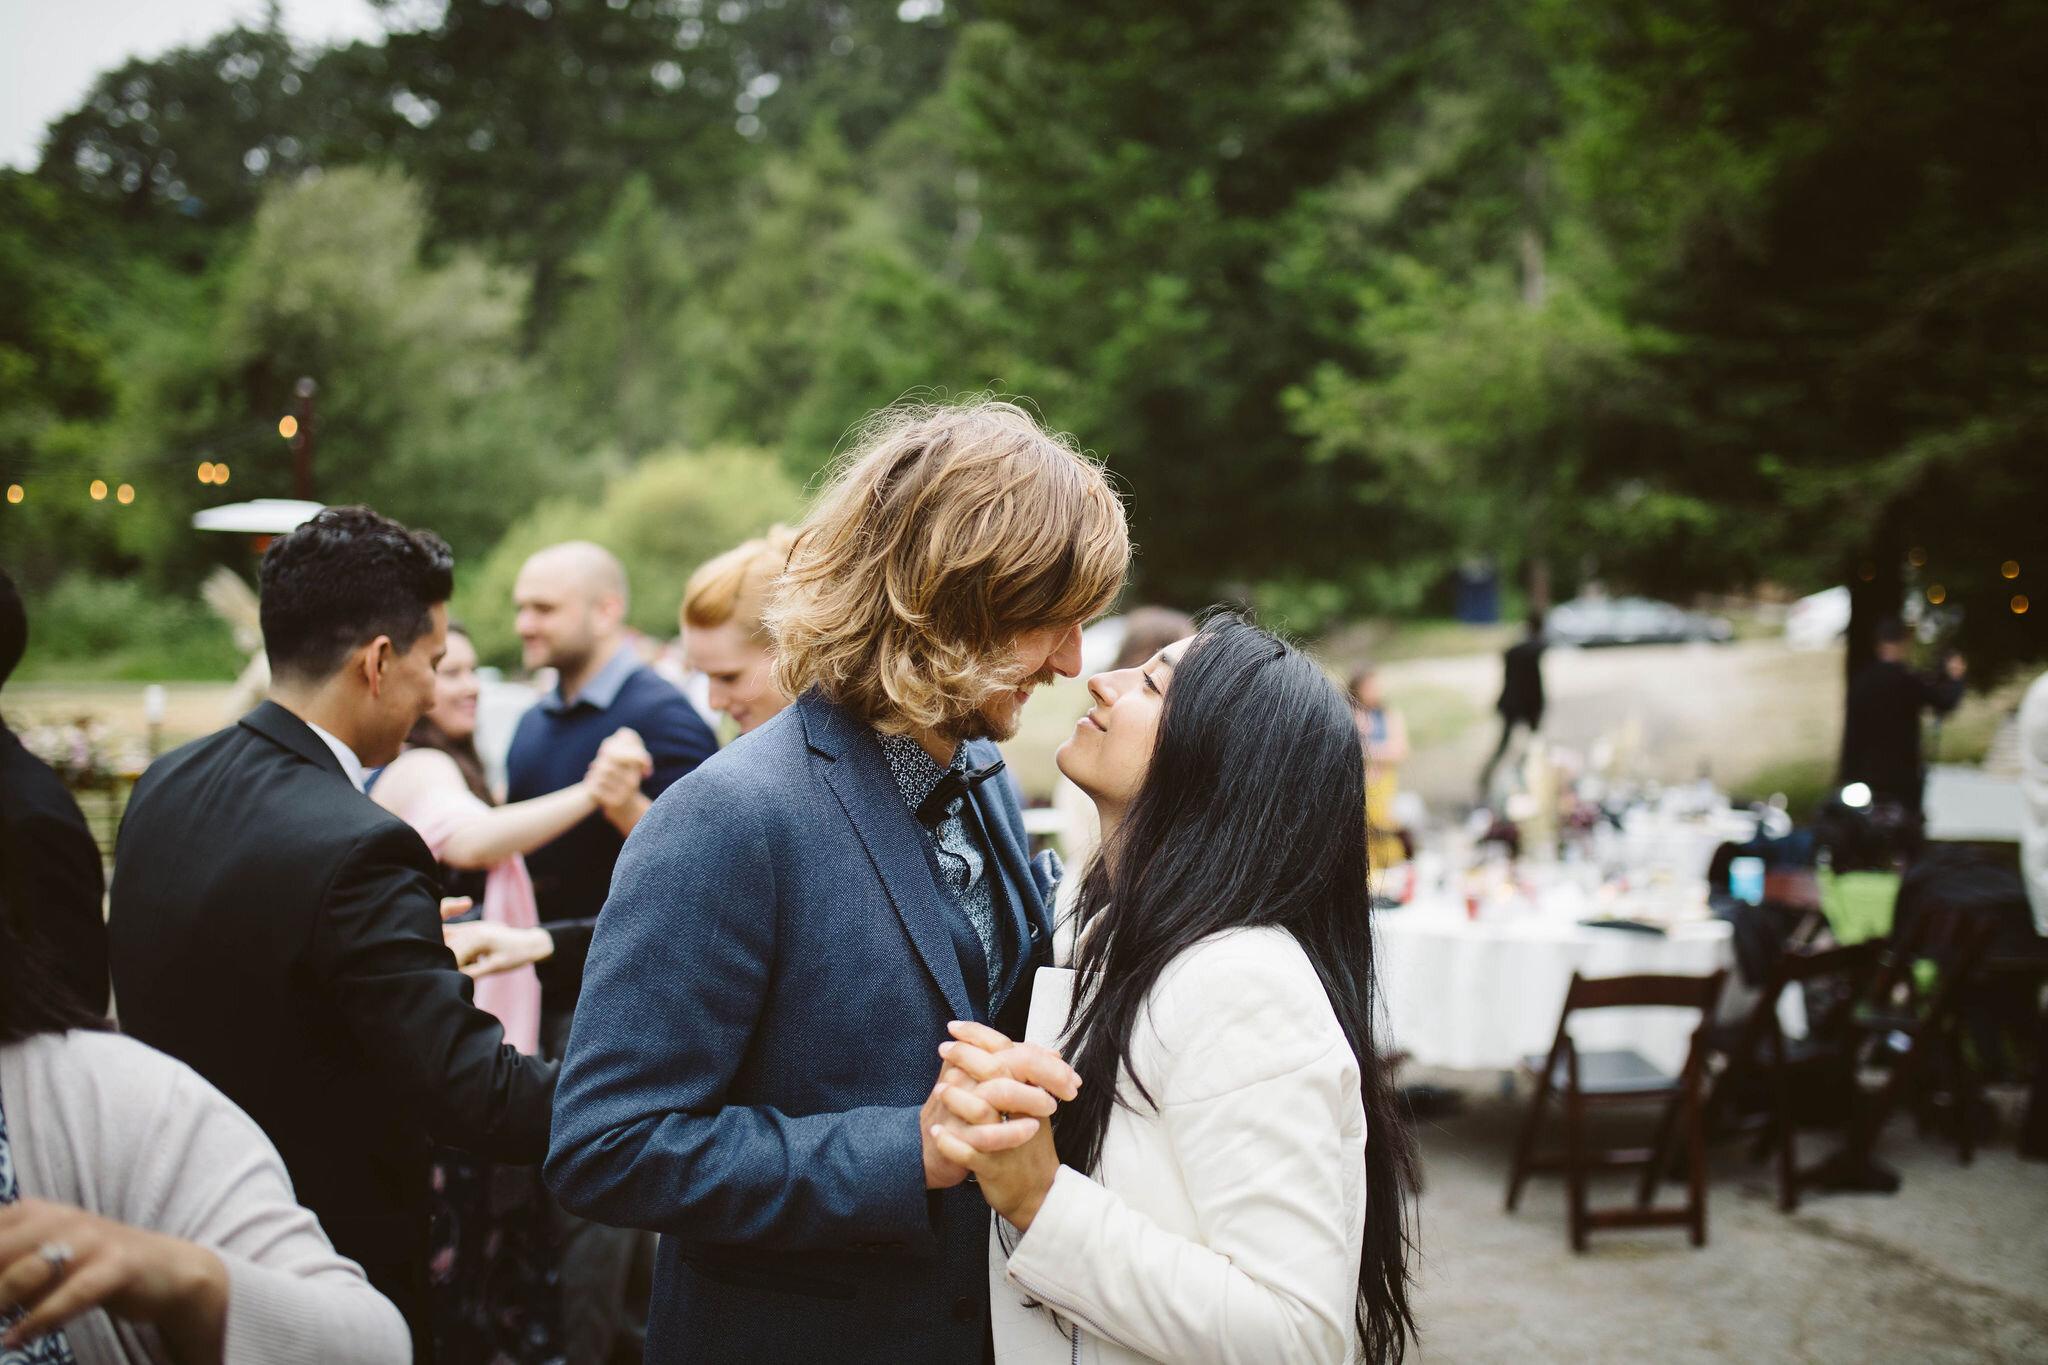 Venture-Retreat-Center-Wedding-Pescadero-Sat-Aaron-Pritam-The-Shalom-Imaginative-719.jpg